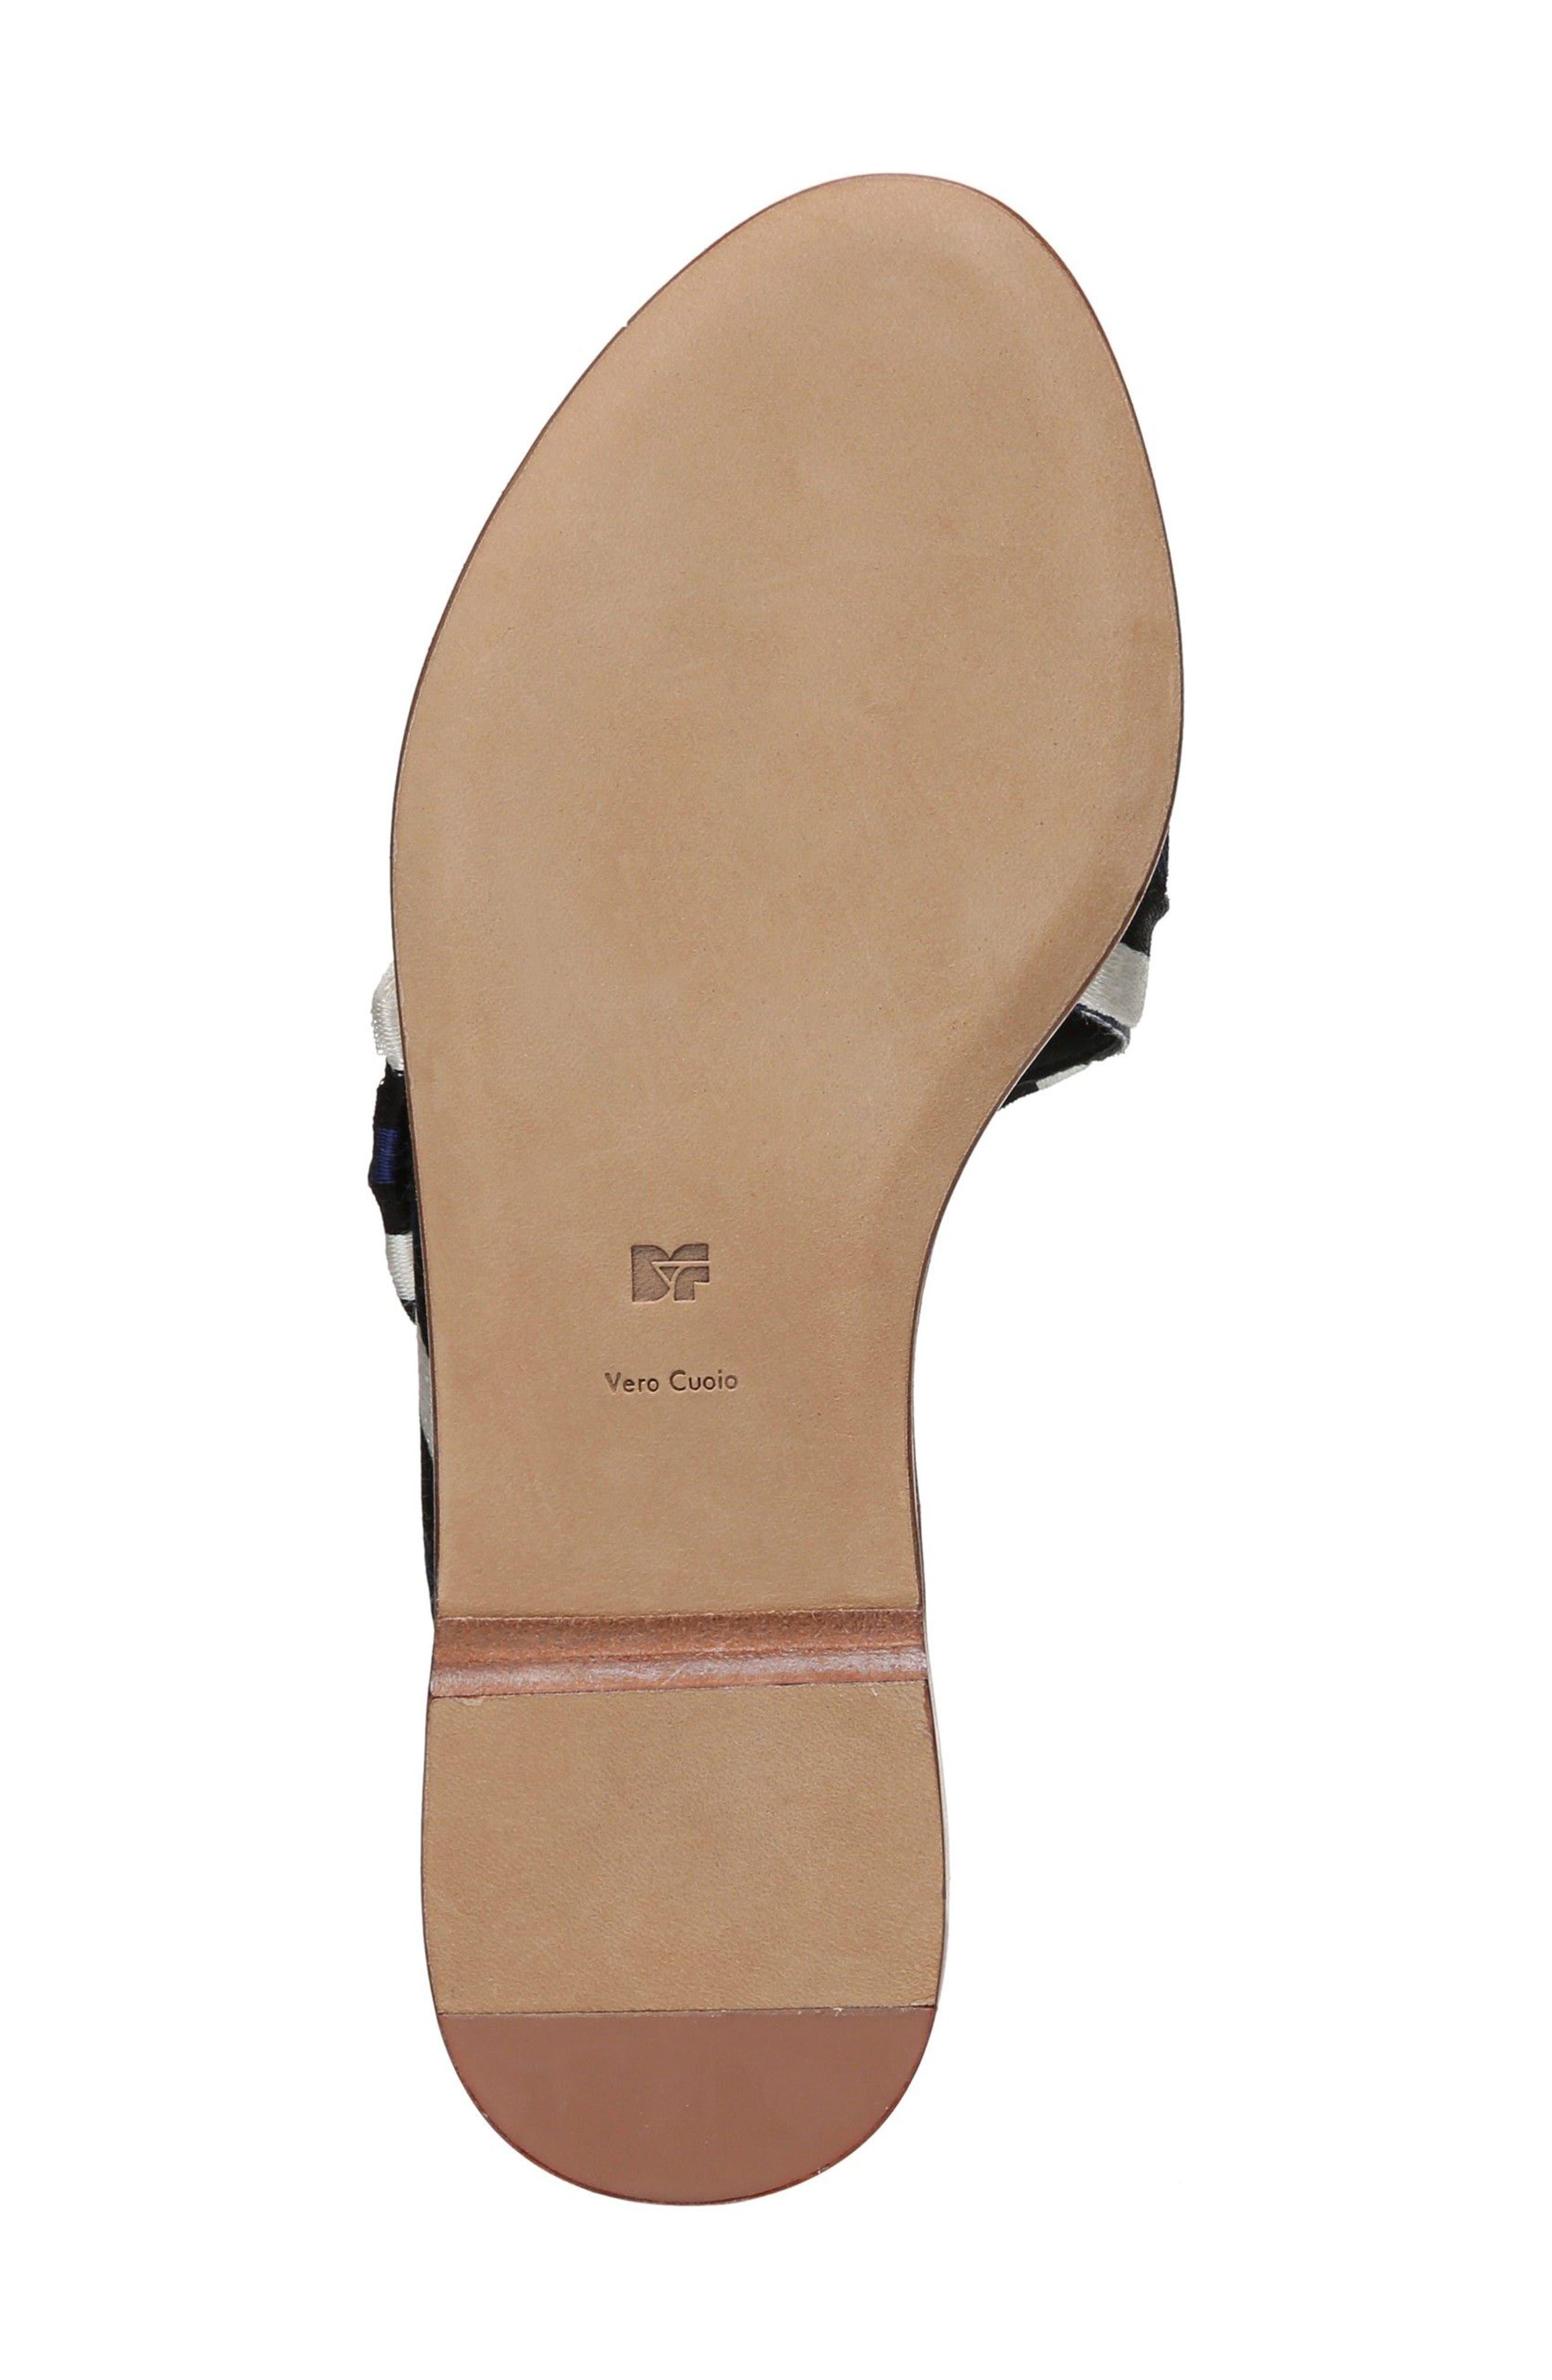 Bella Asymmetrical Slide Sandal,                             Alternate thumbnail 6, color,                             400